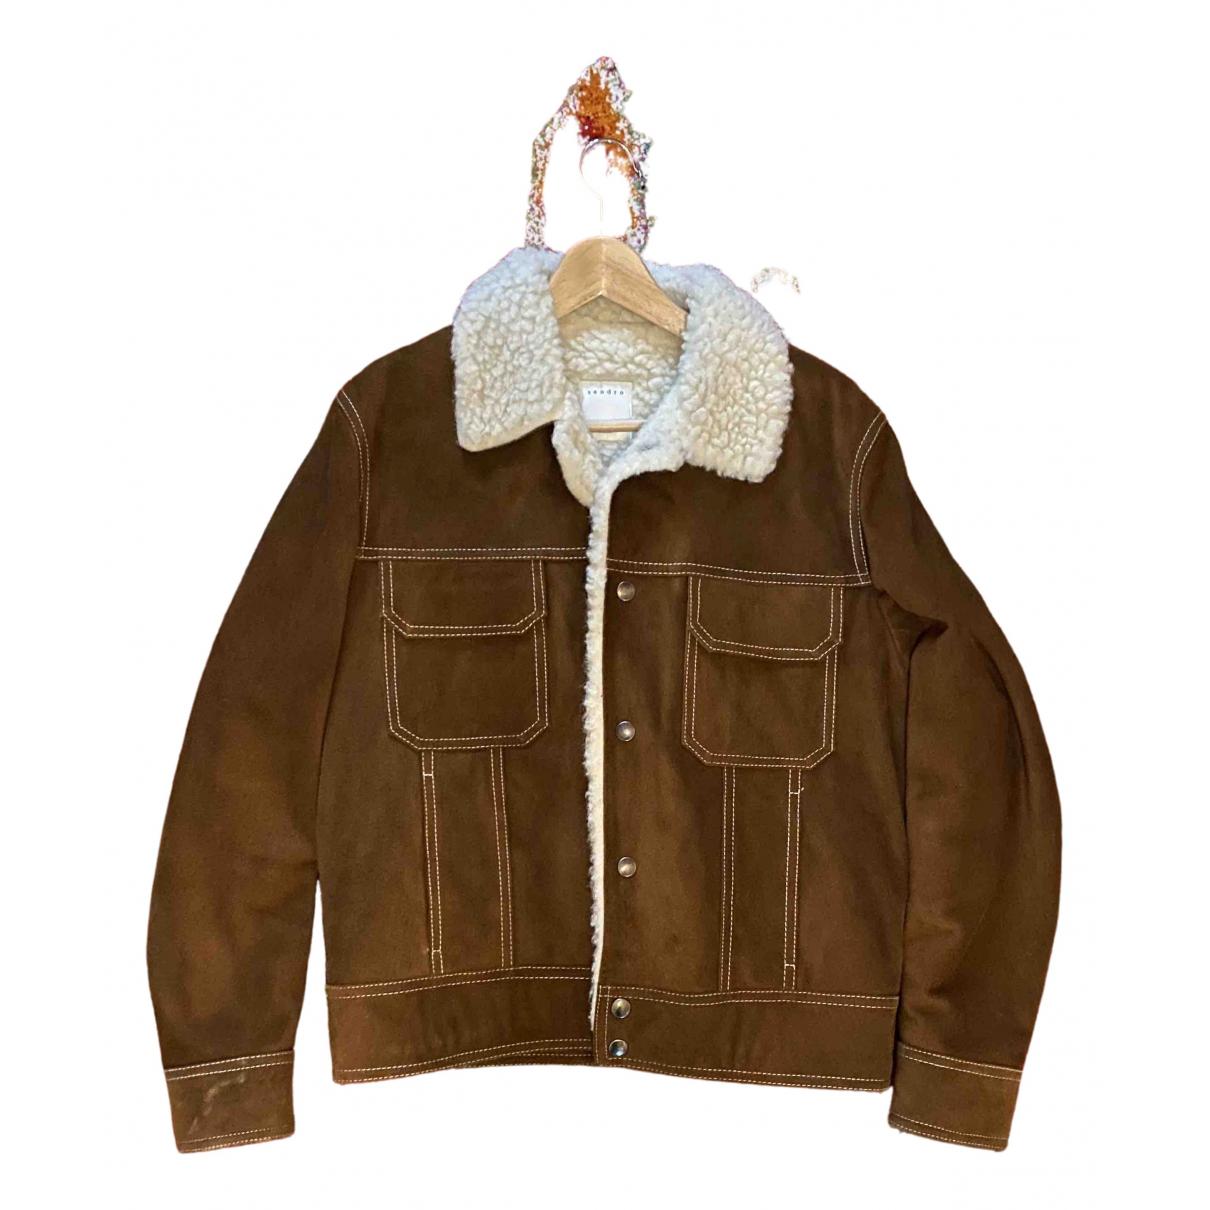 Sandro \N Brown Leather jacket  for Men L International